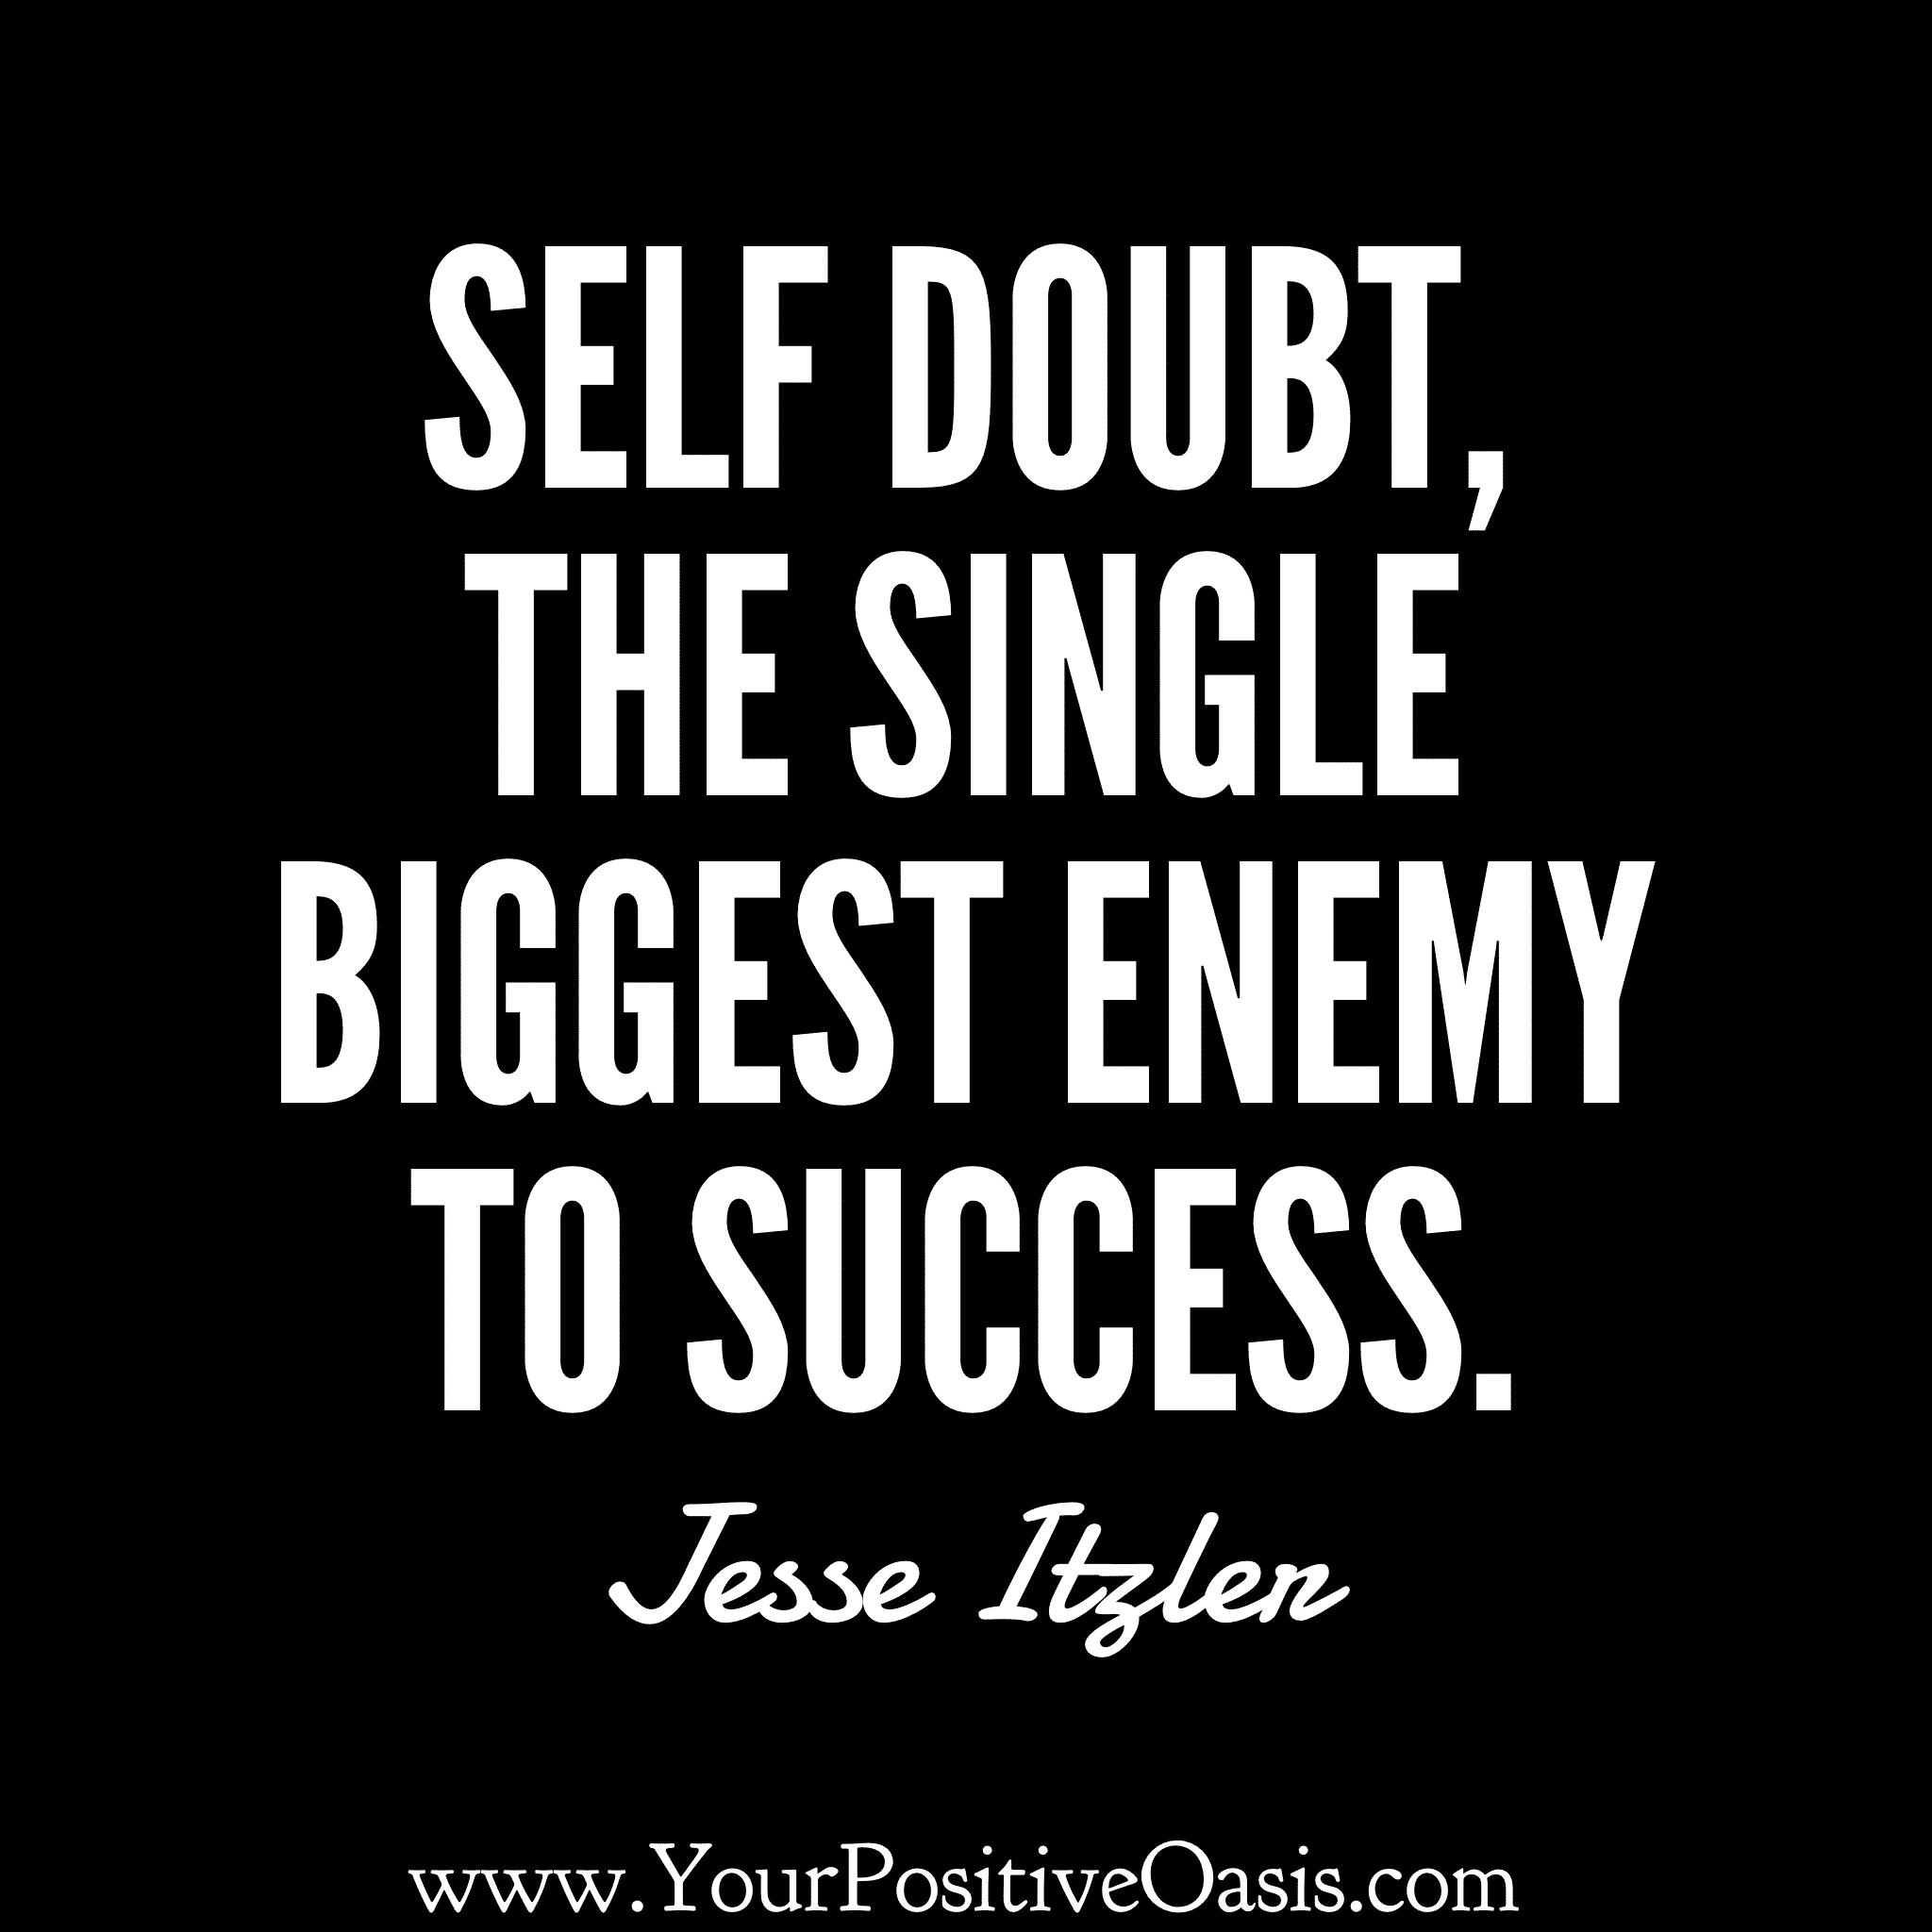 Highly Motivational Jesse Itzler Quotes